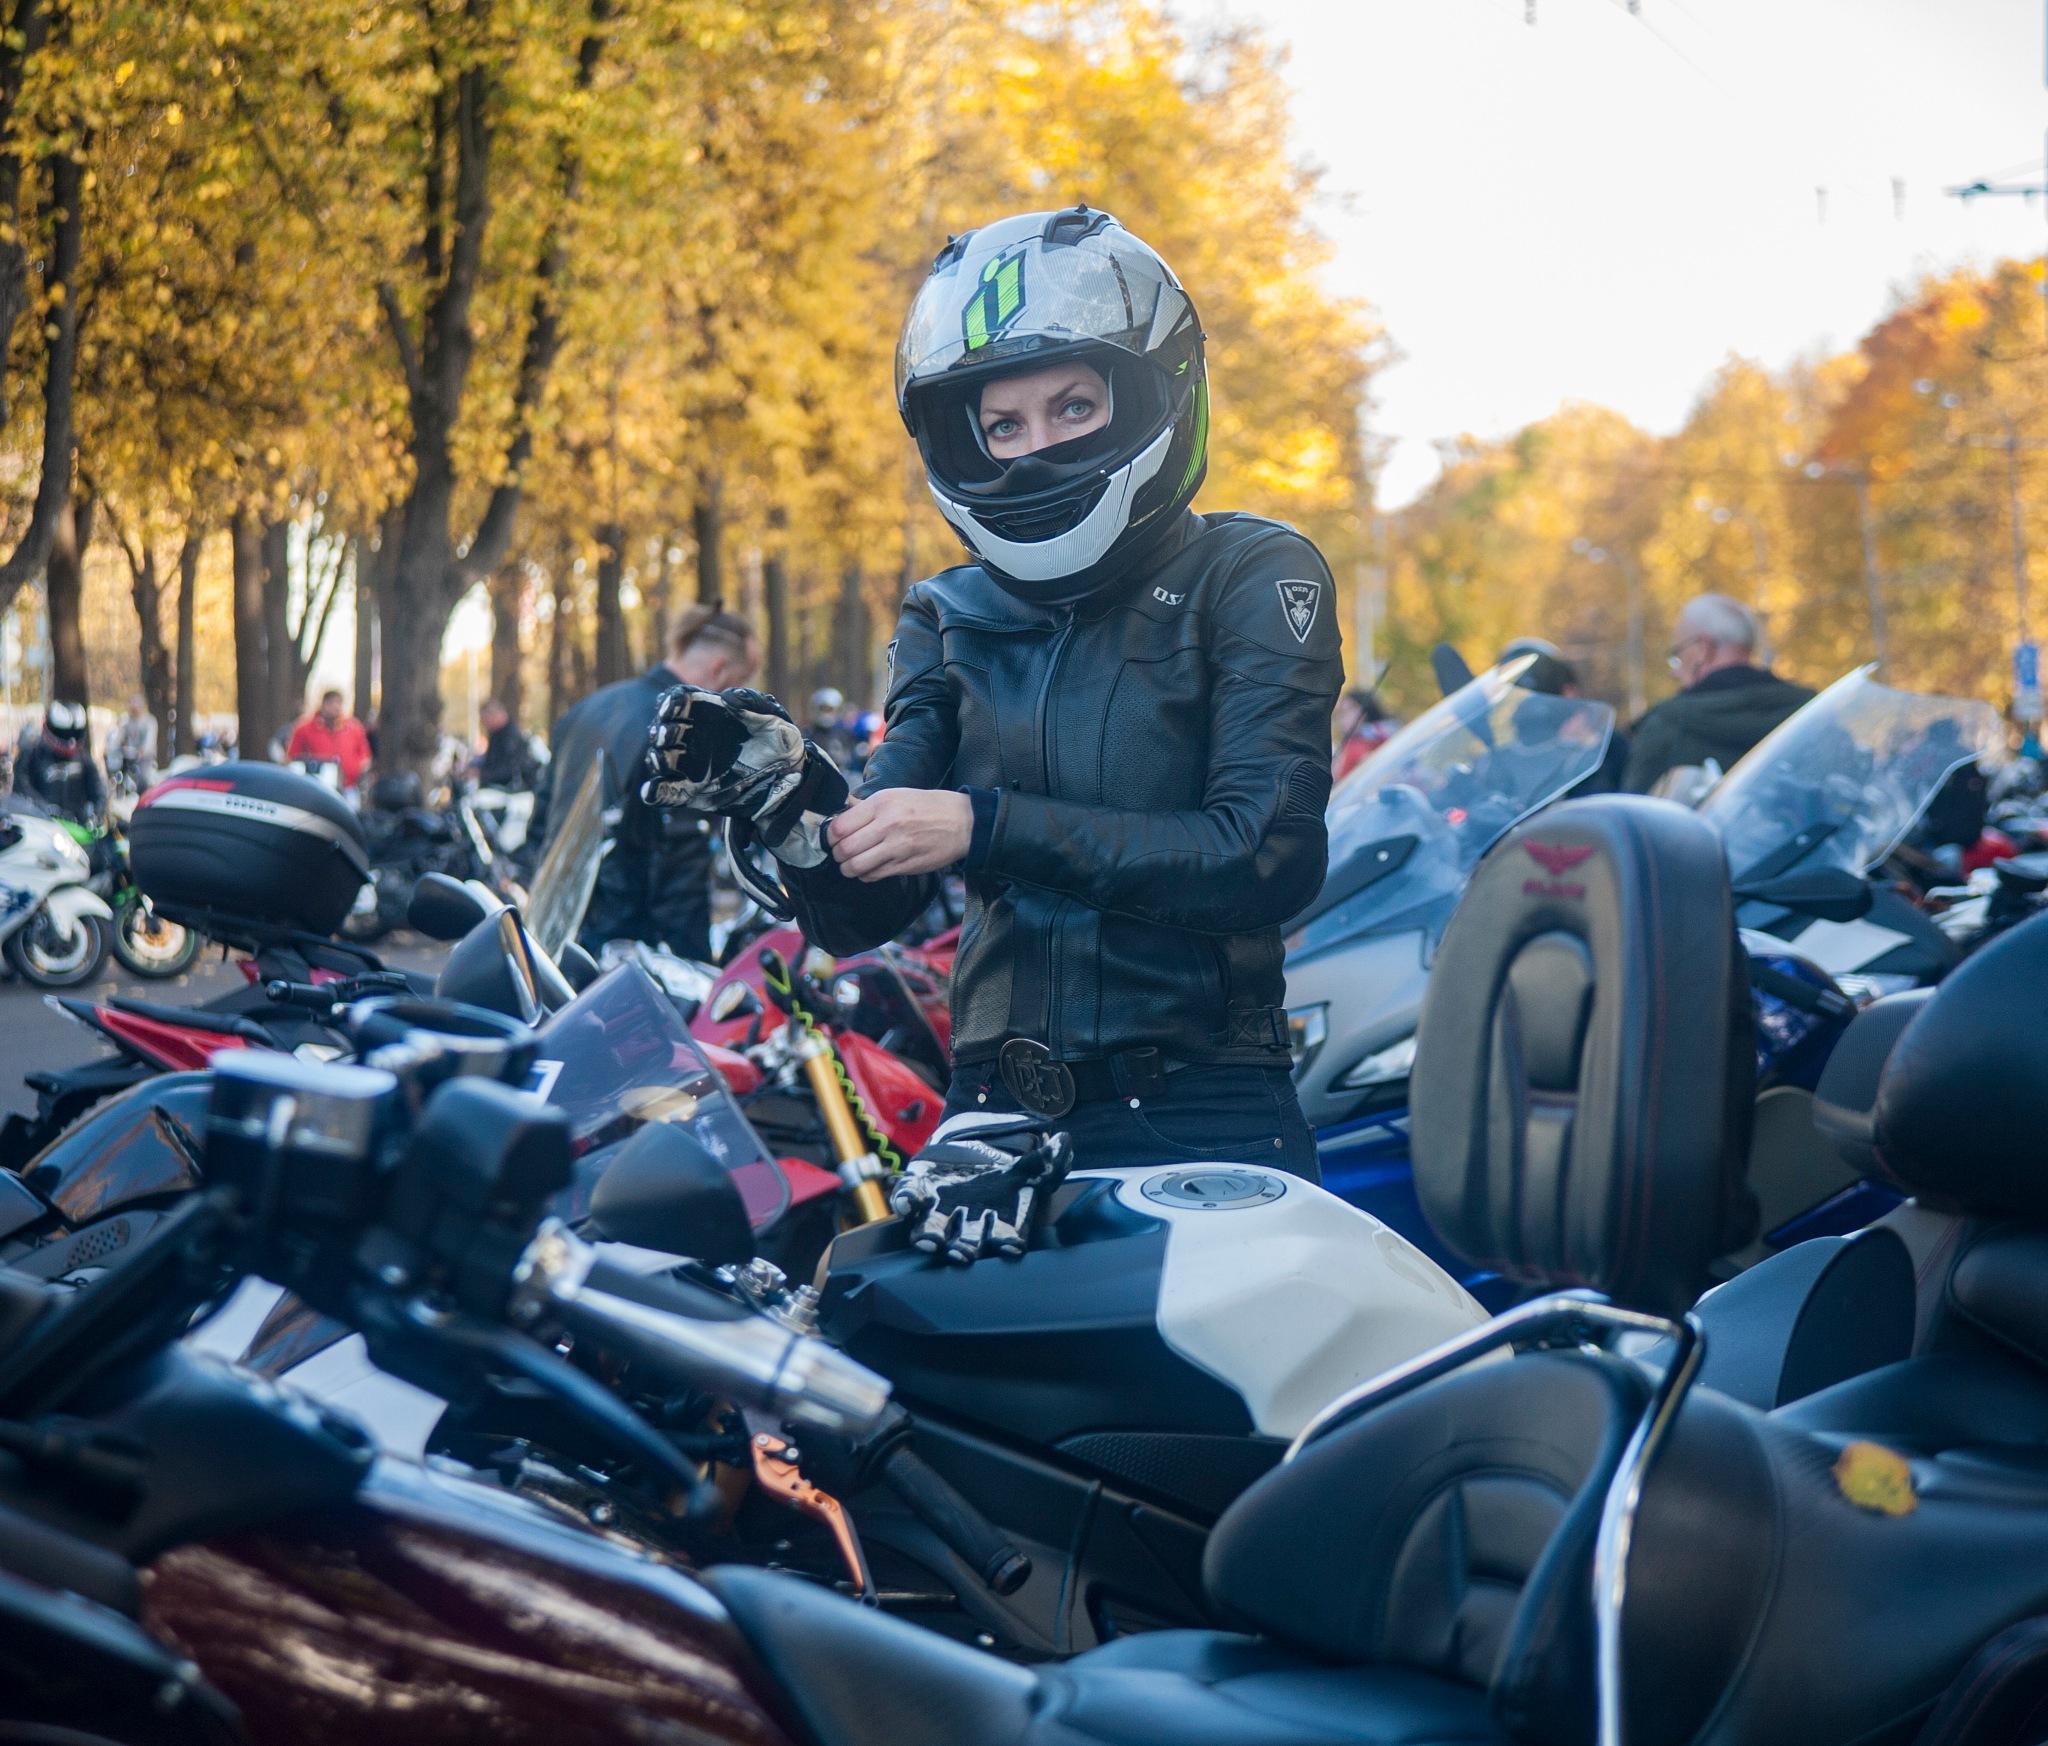 Motogirl in the autumn park by kalashnikov